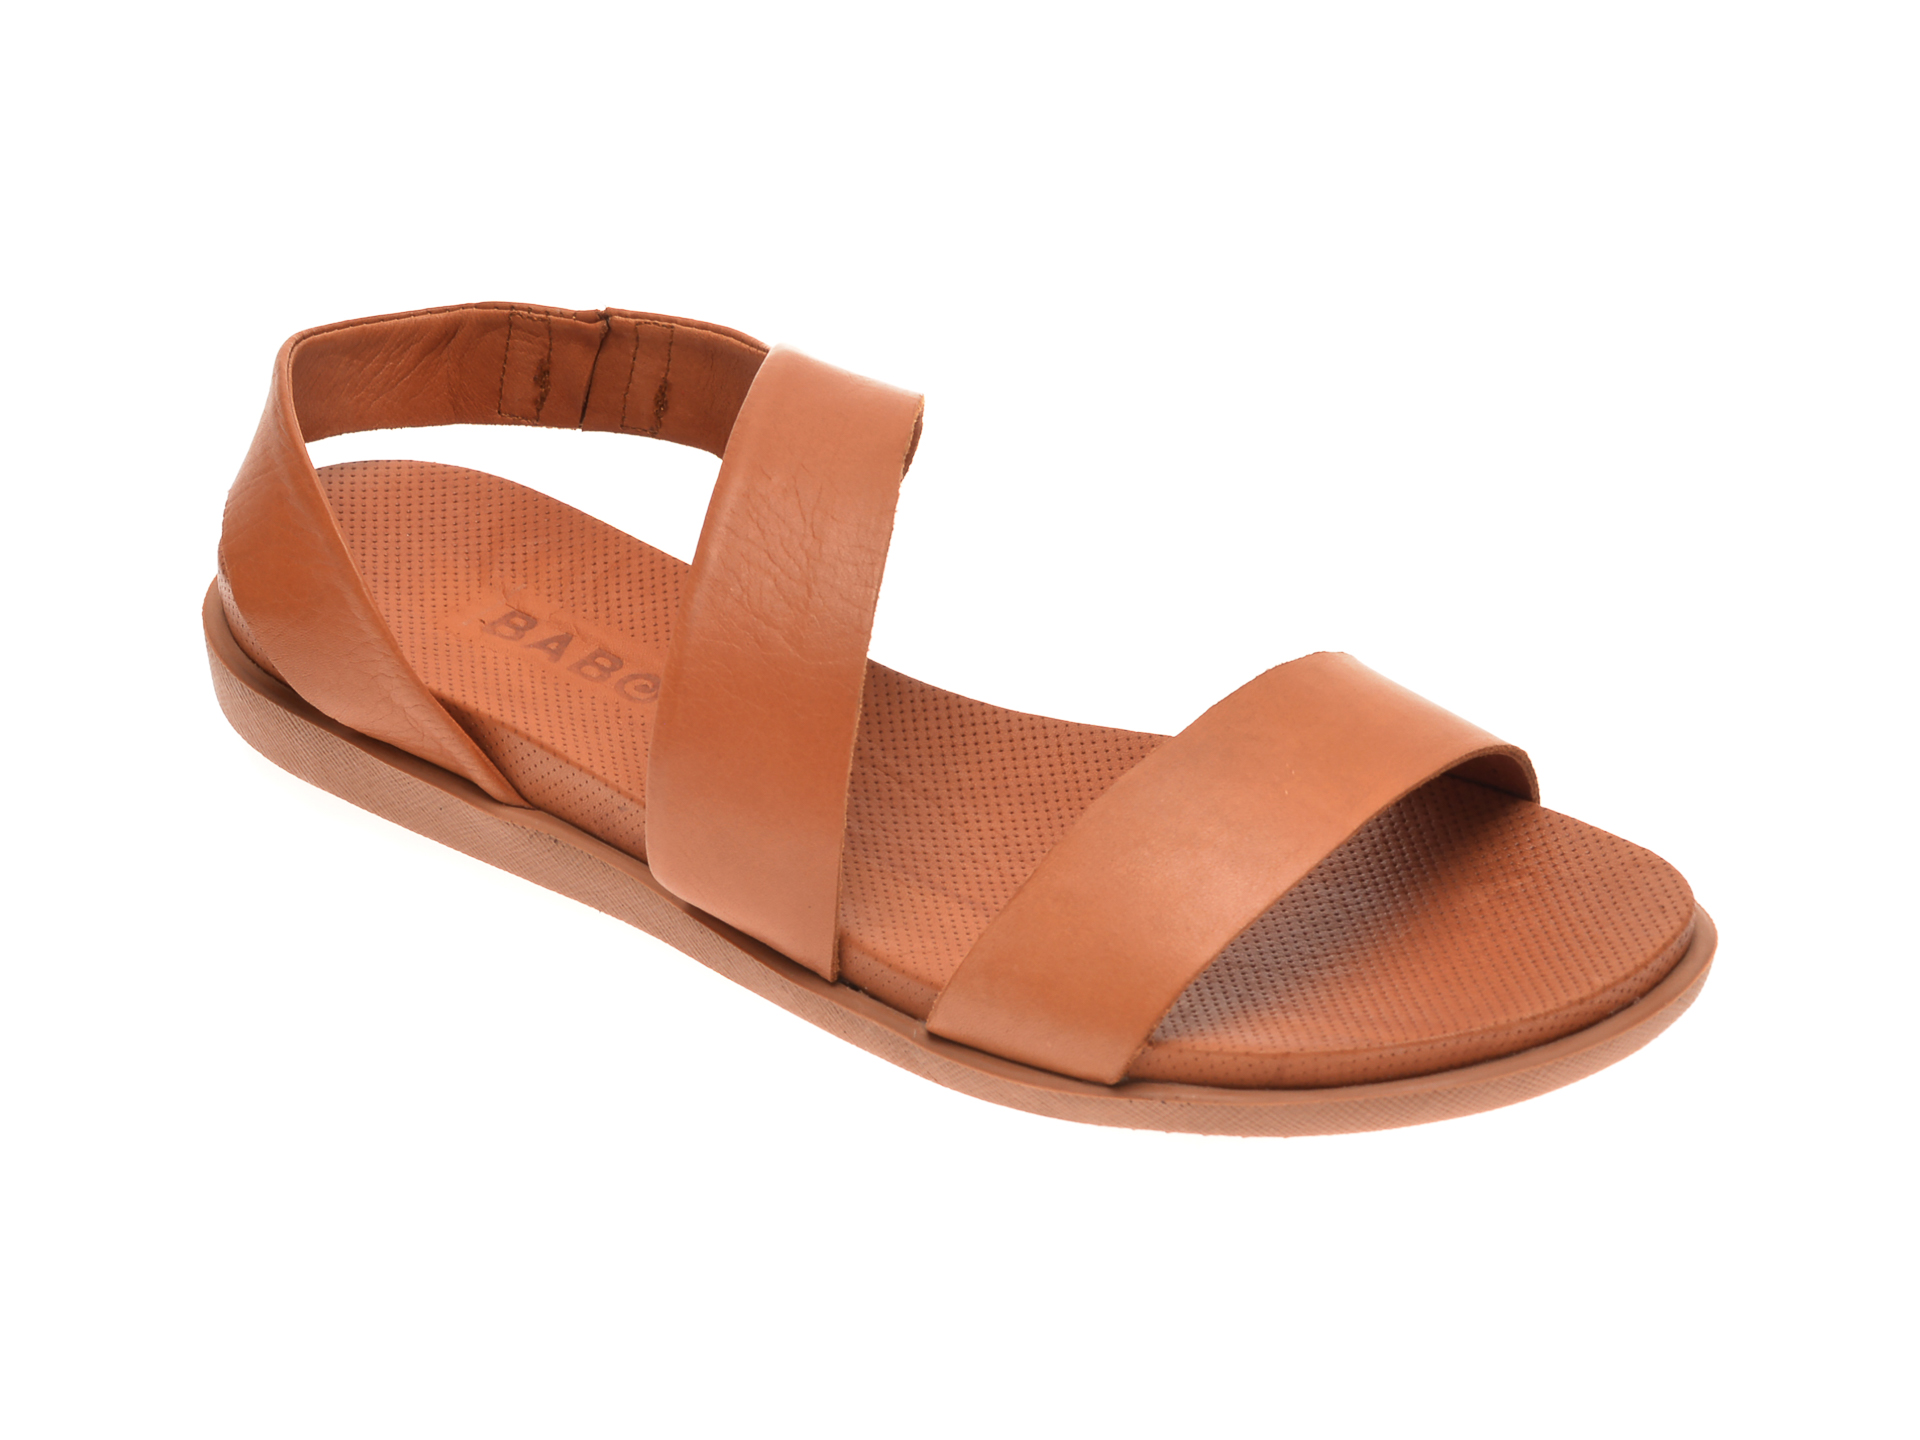 Sandale BABOOS maro, 1402, din piele naturala imagine